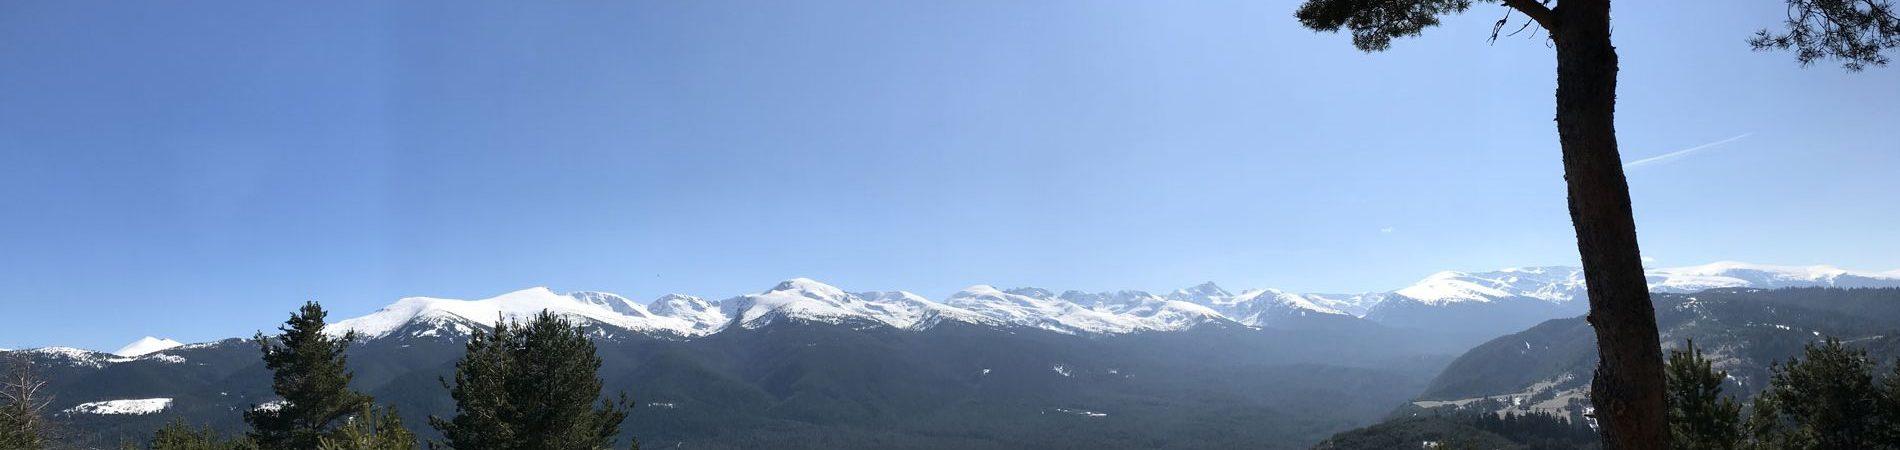 Day-Tour-Panoramic-Hike-12